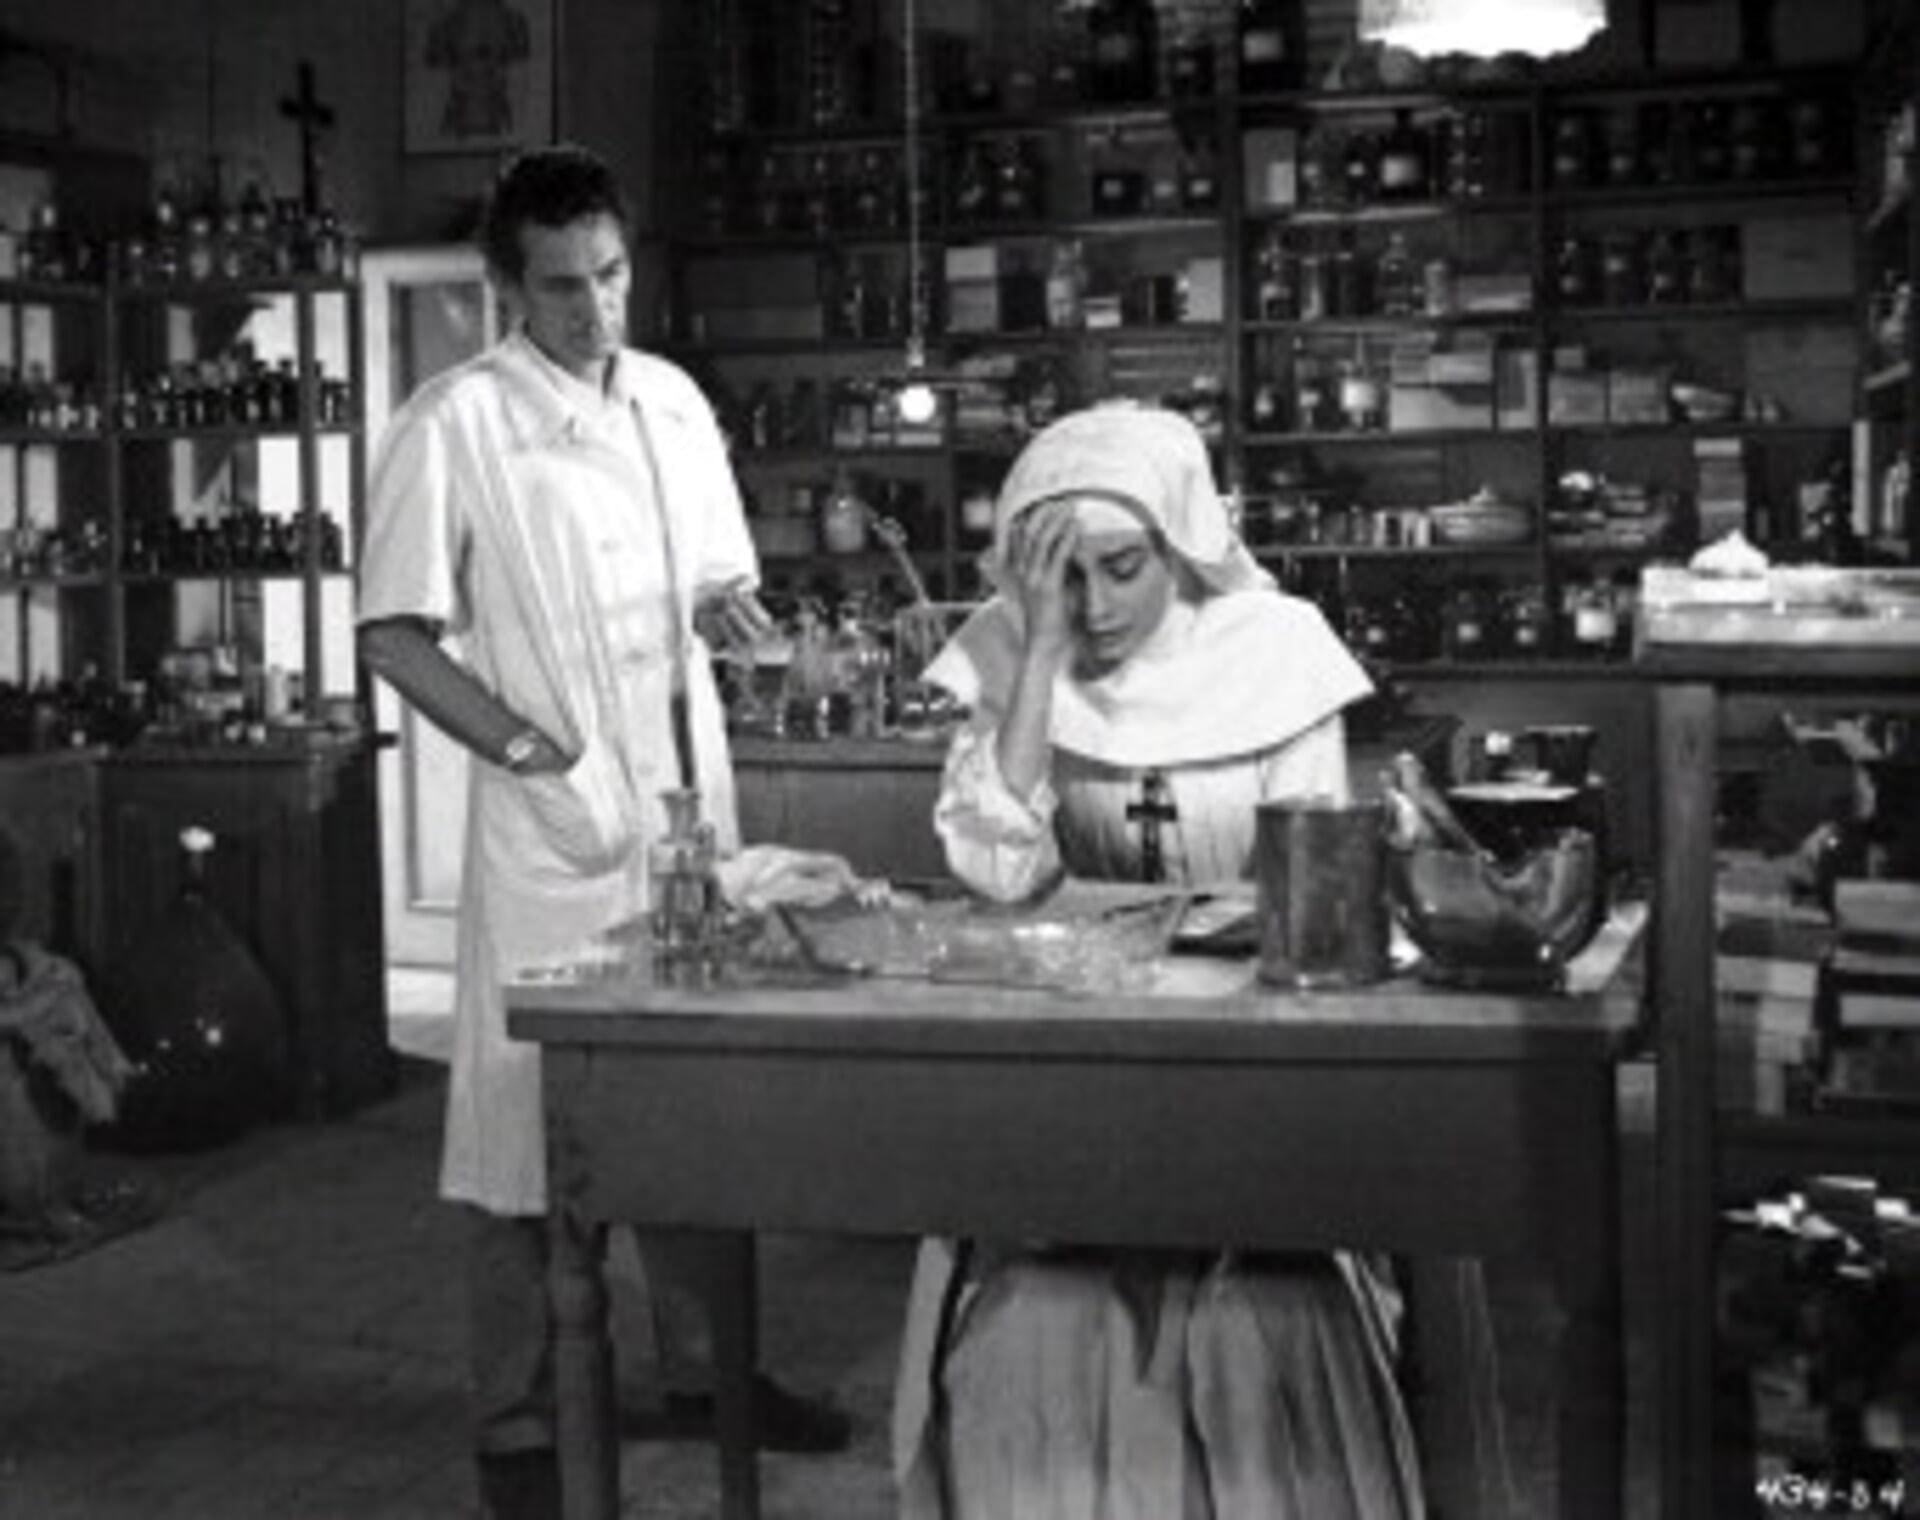 The Nun's Story - Image 6